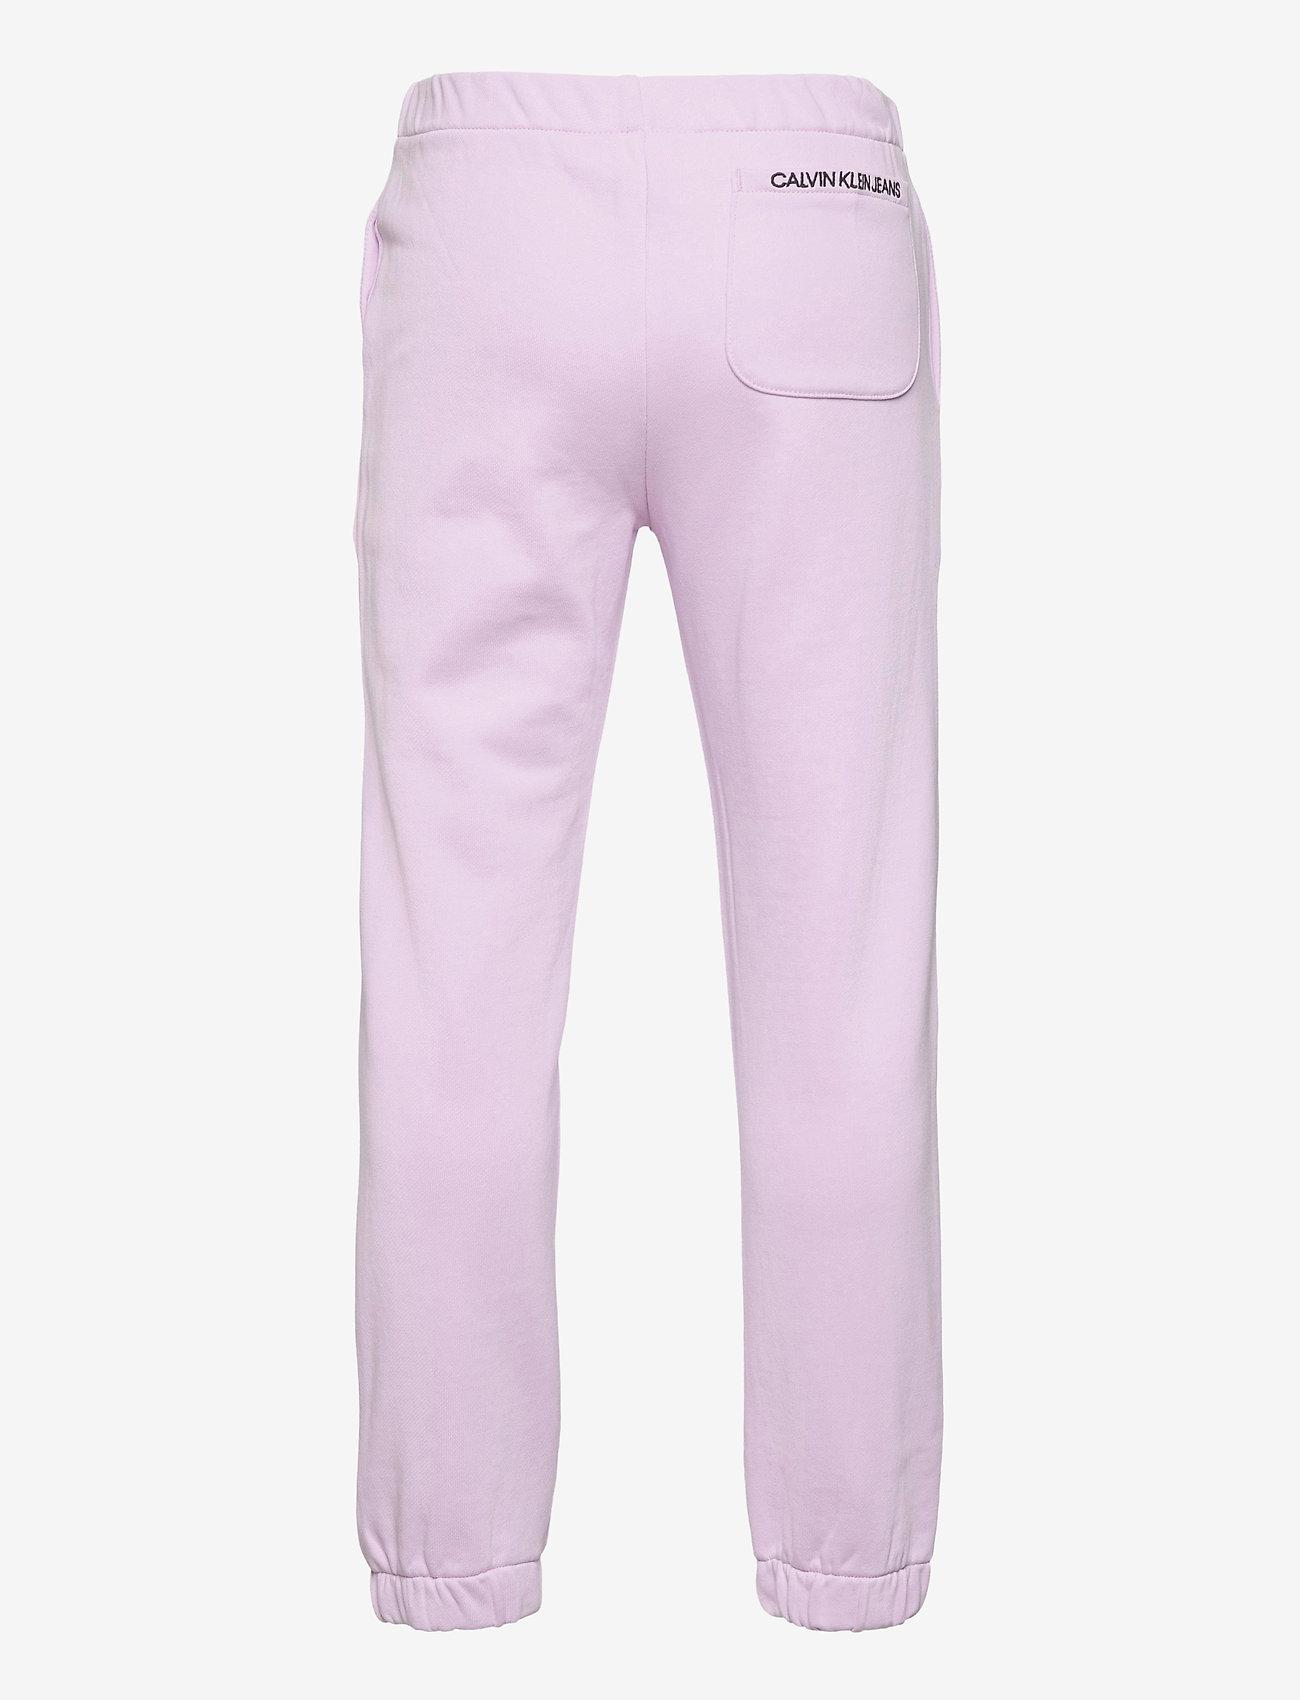 Calvin Klein - RELAXED ELASTIC SWEATPANTS - jogginghosen - lavender pink - 1